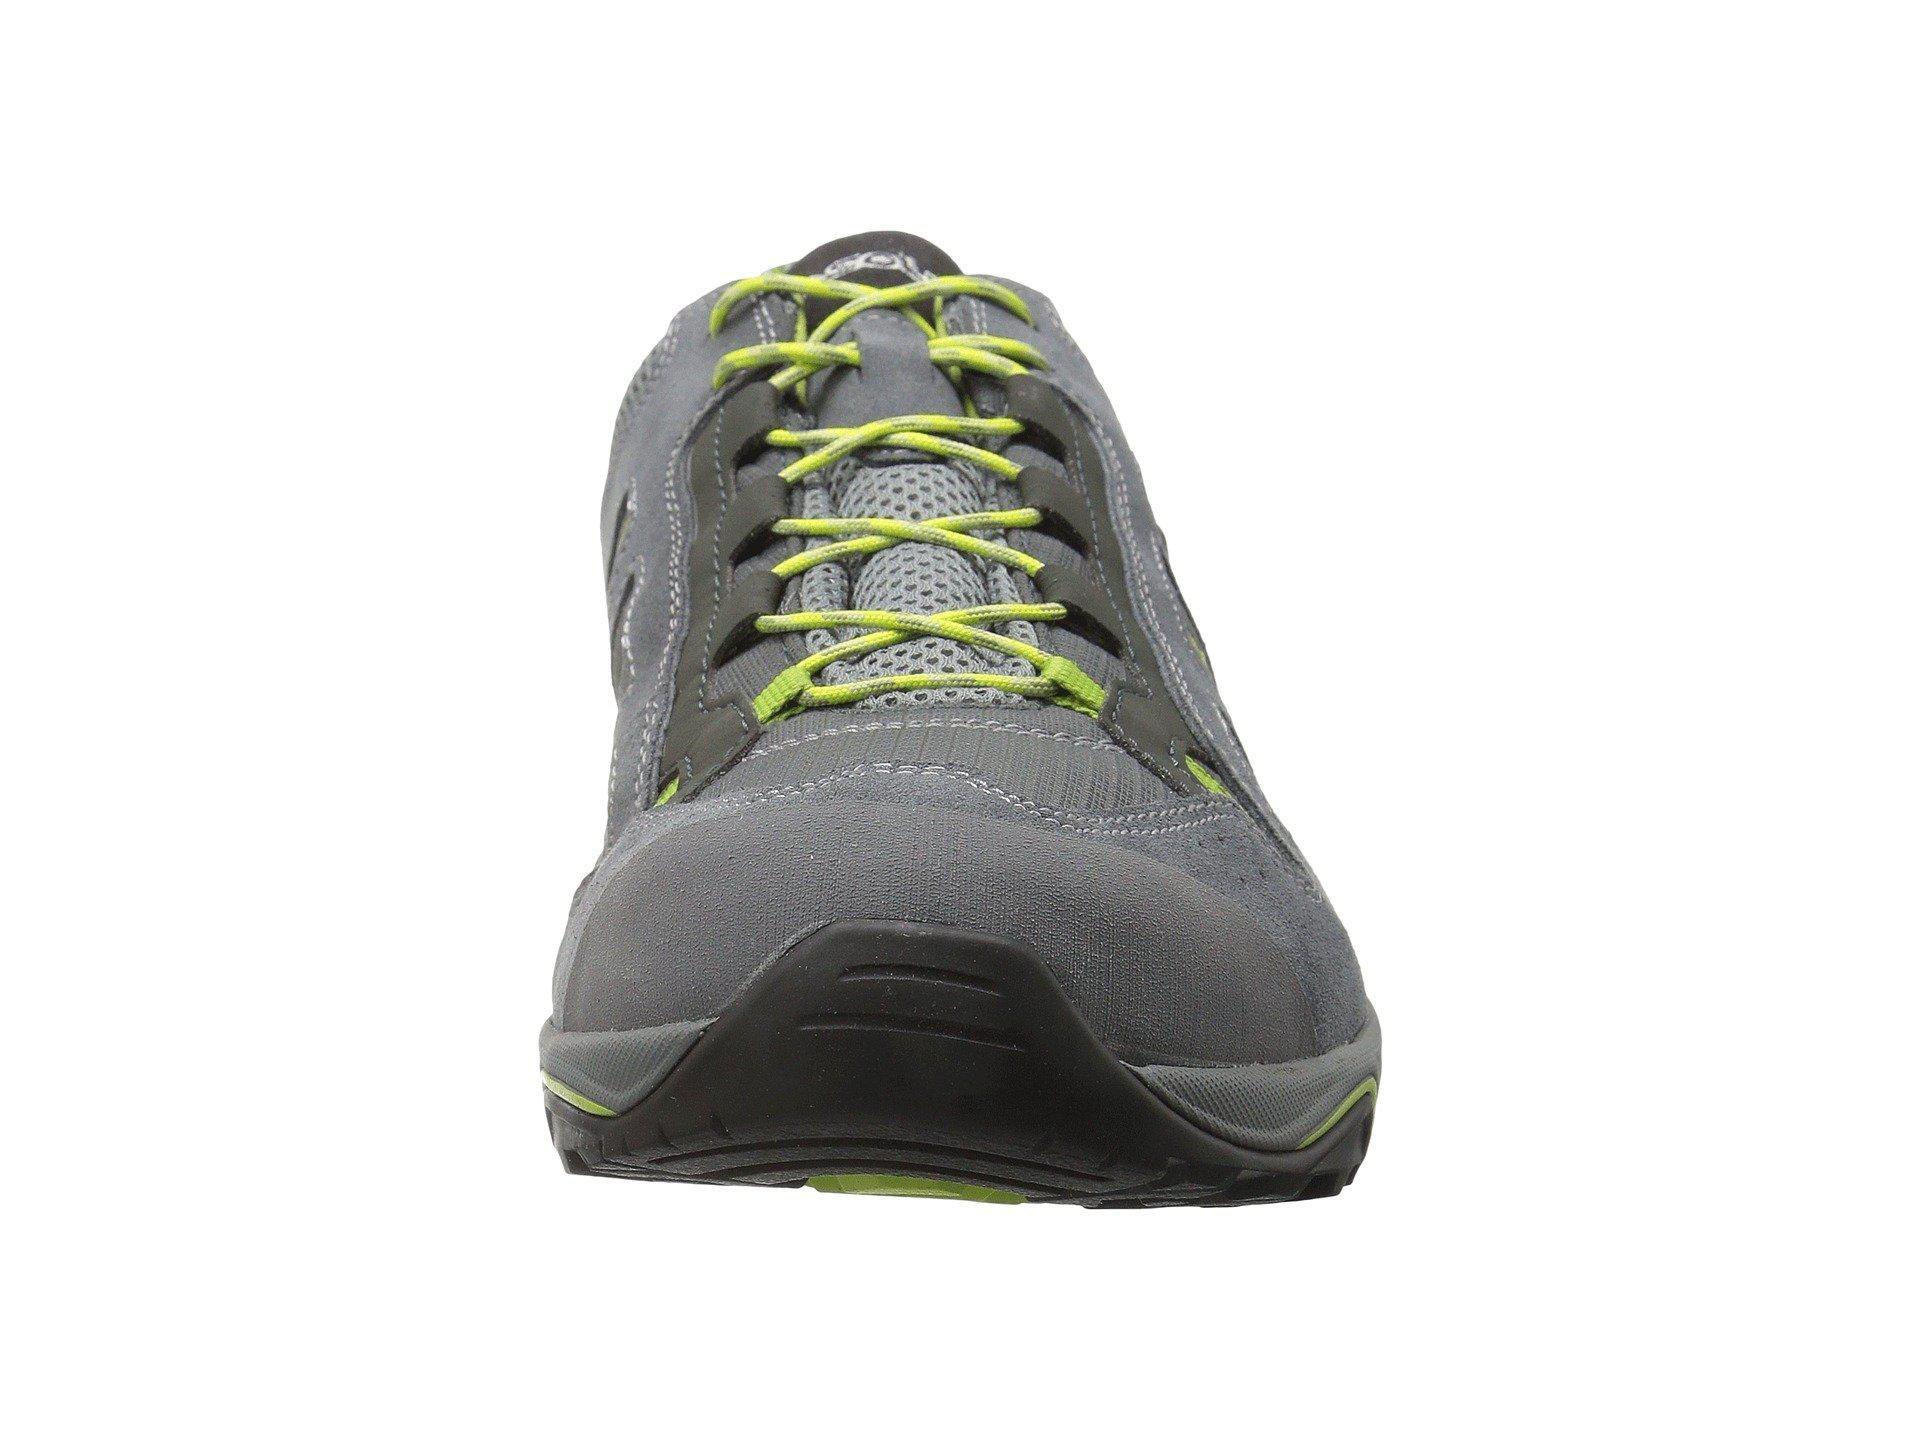 Megaton Meaning The Asolo Elephantmarrone Mens V Gv Shoes Of 6bfy7g